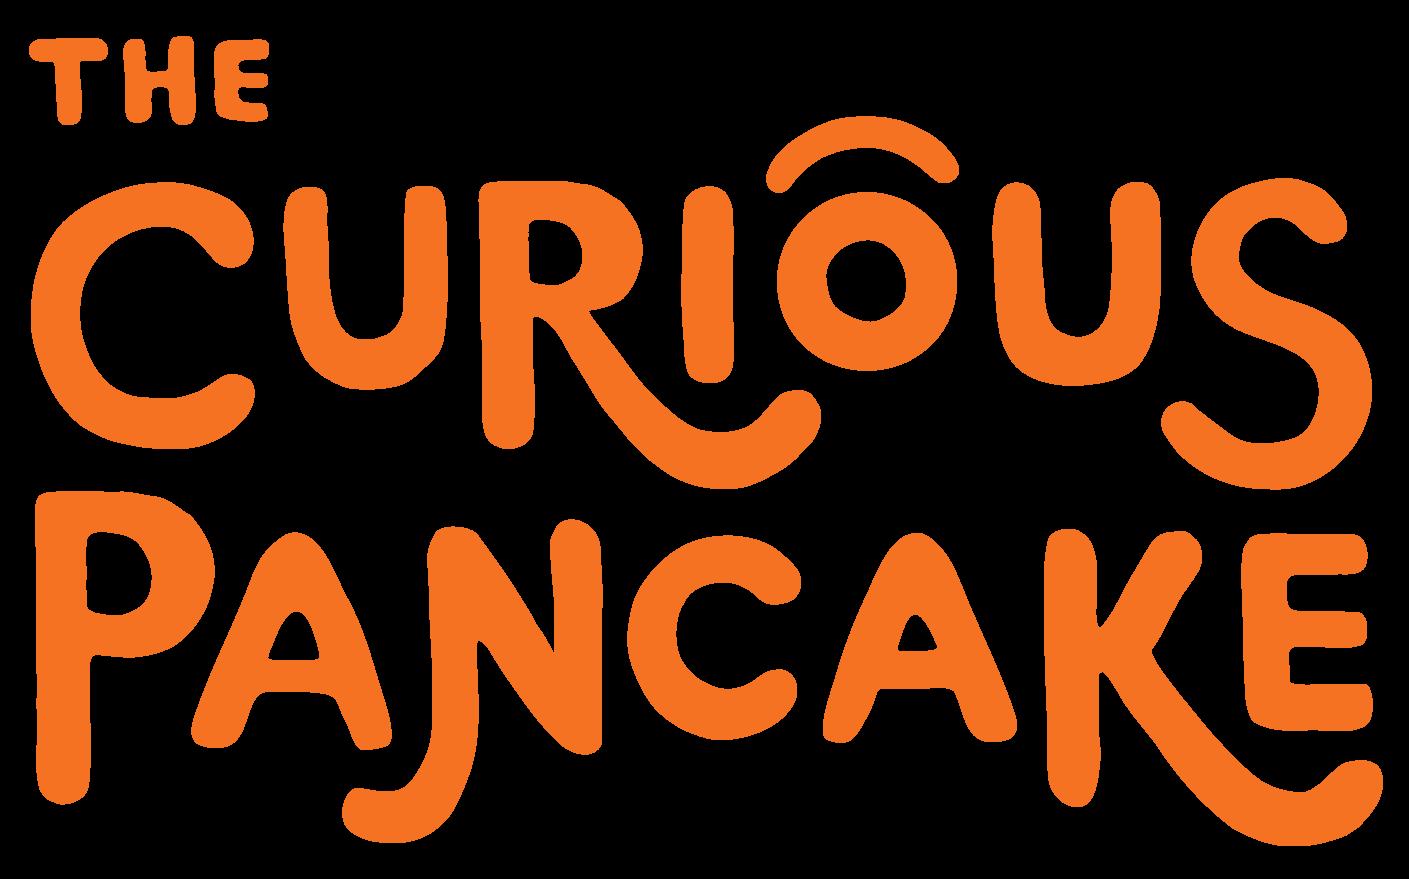 Read The Curious Pancake Reviews